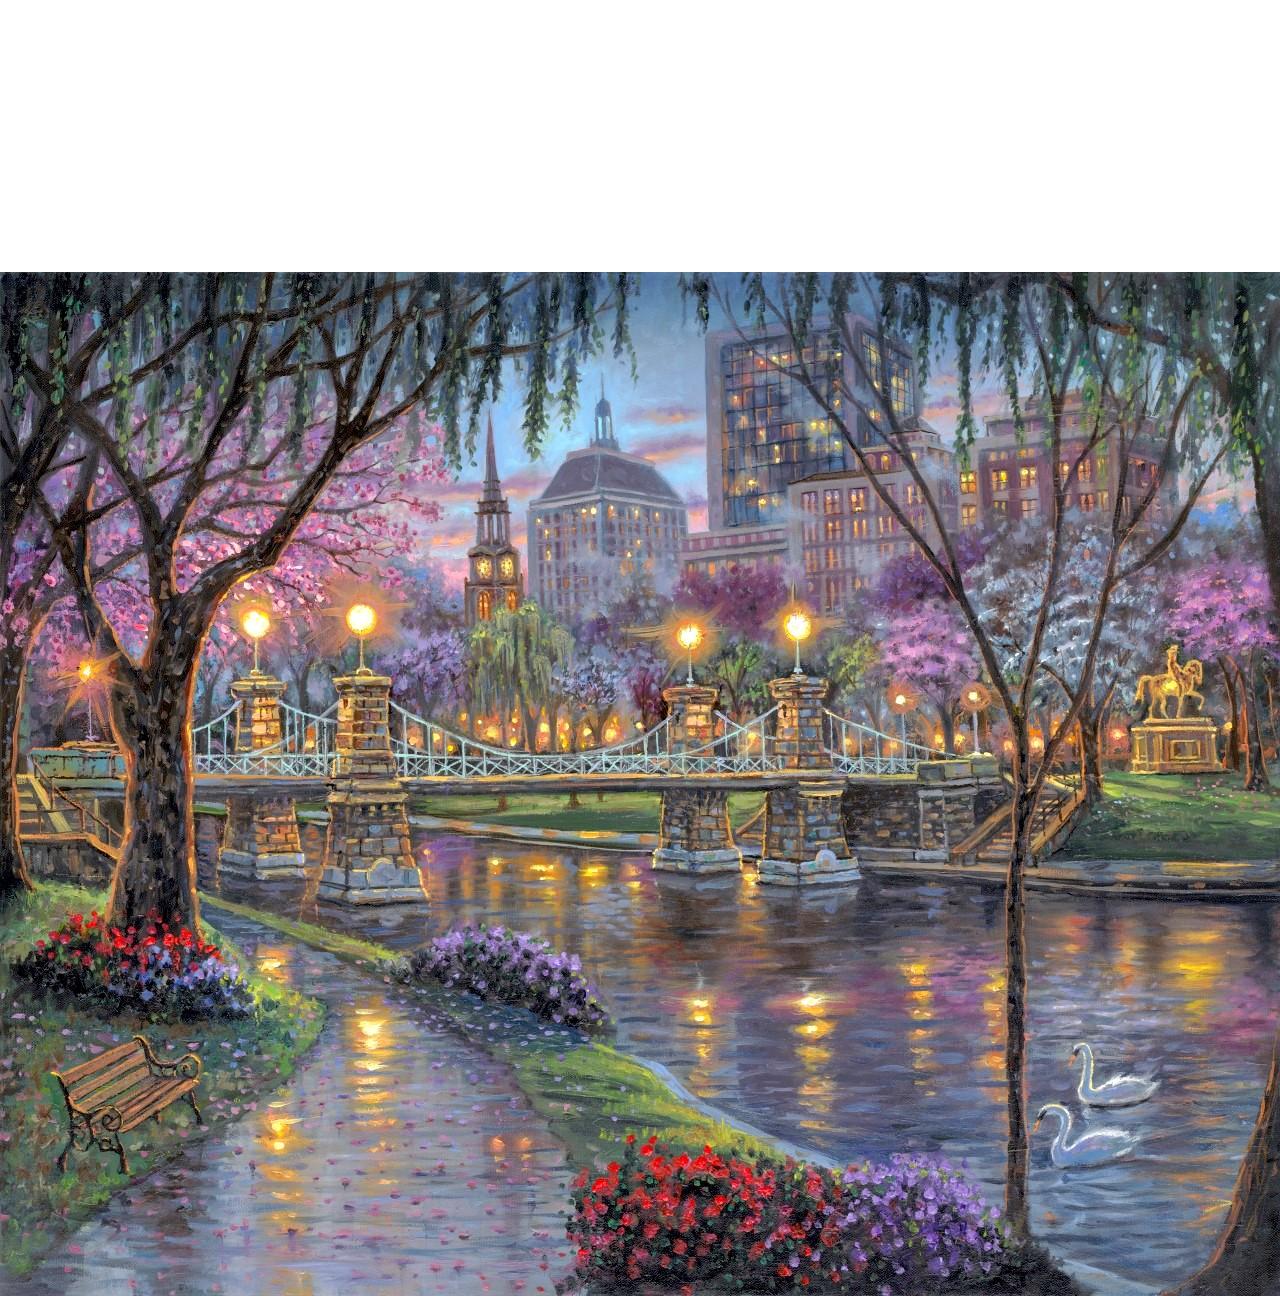 Robert Finale_painter_ romantic_ impressionist art_ Americana art_painter of light within_cityscapes_European art_oil painter